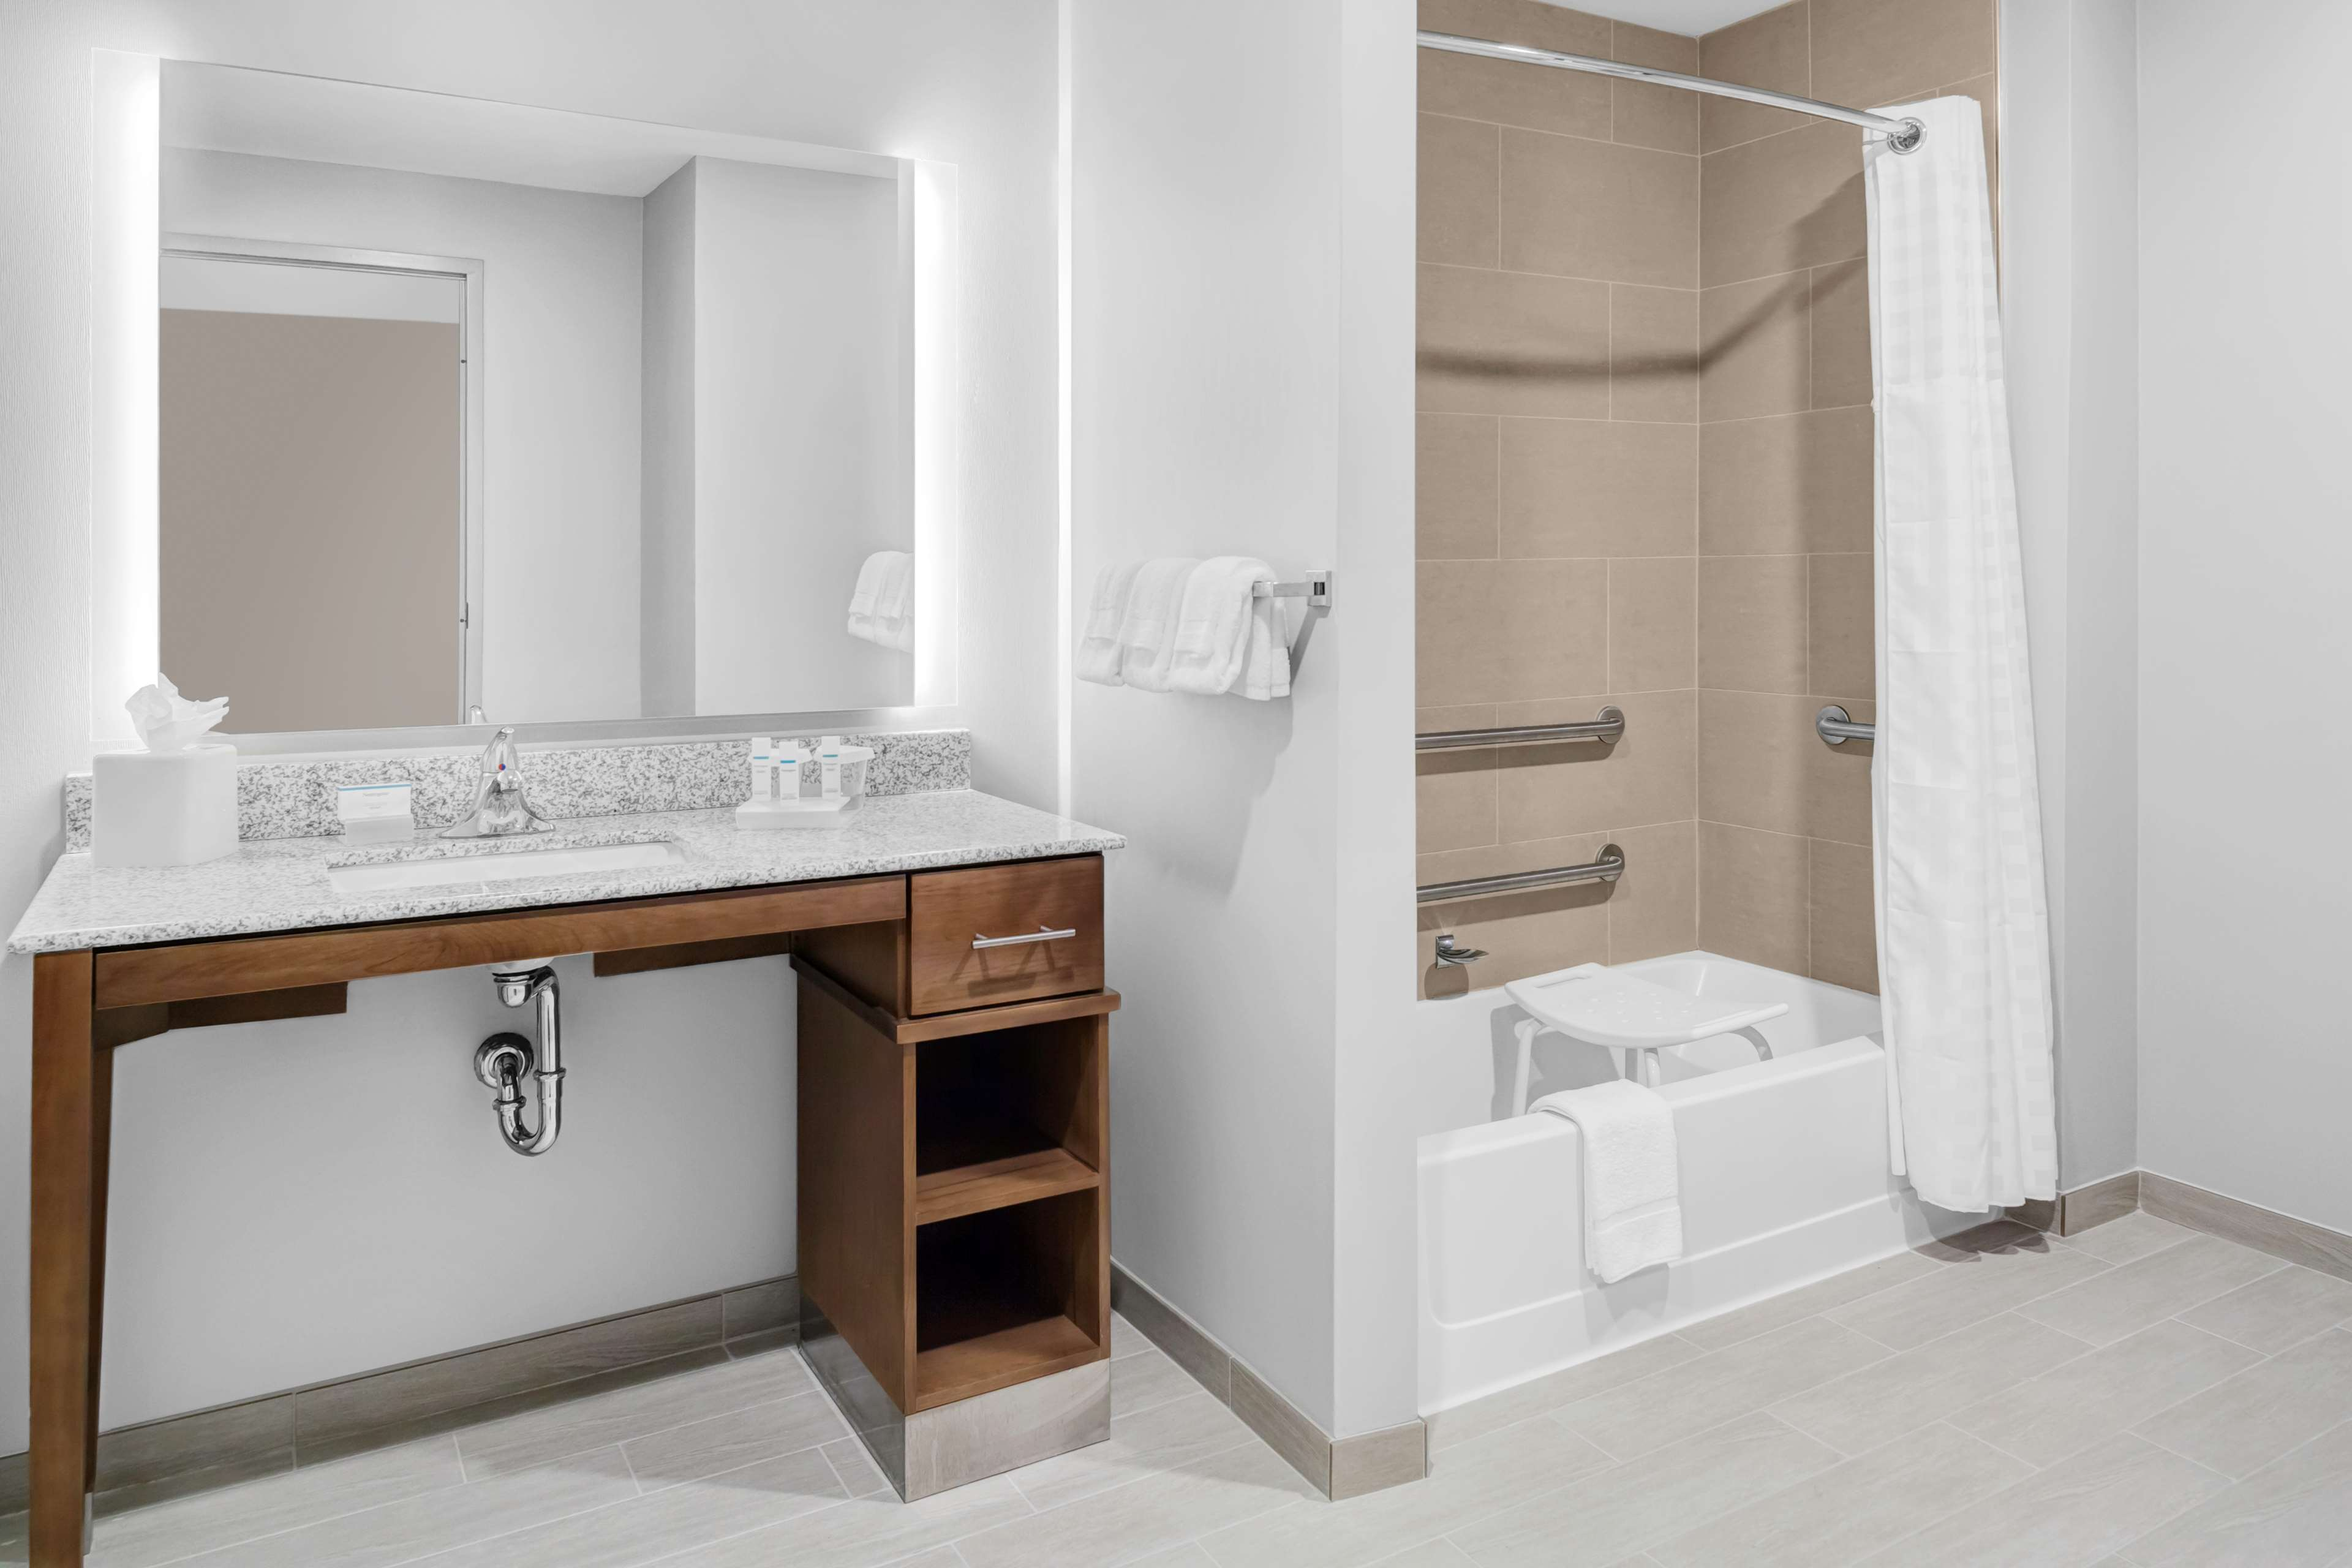 Homewood Suites by Hilton Wauwatosa Milwaukee image 17